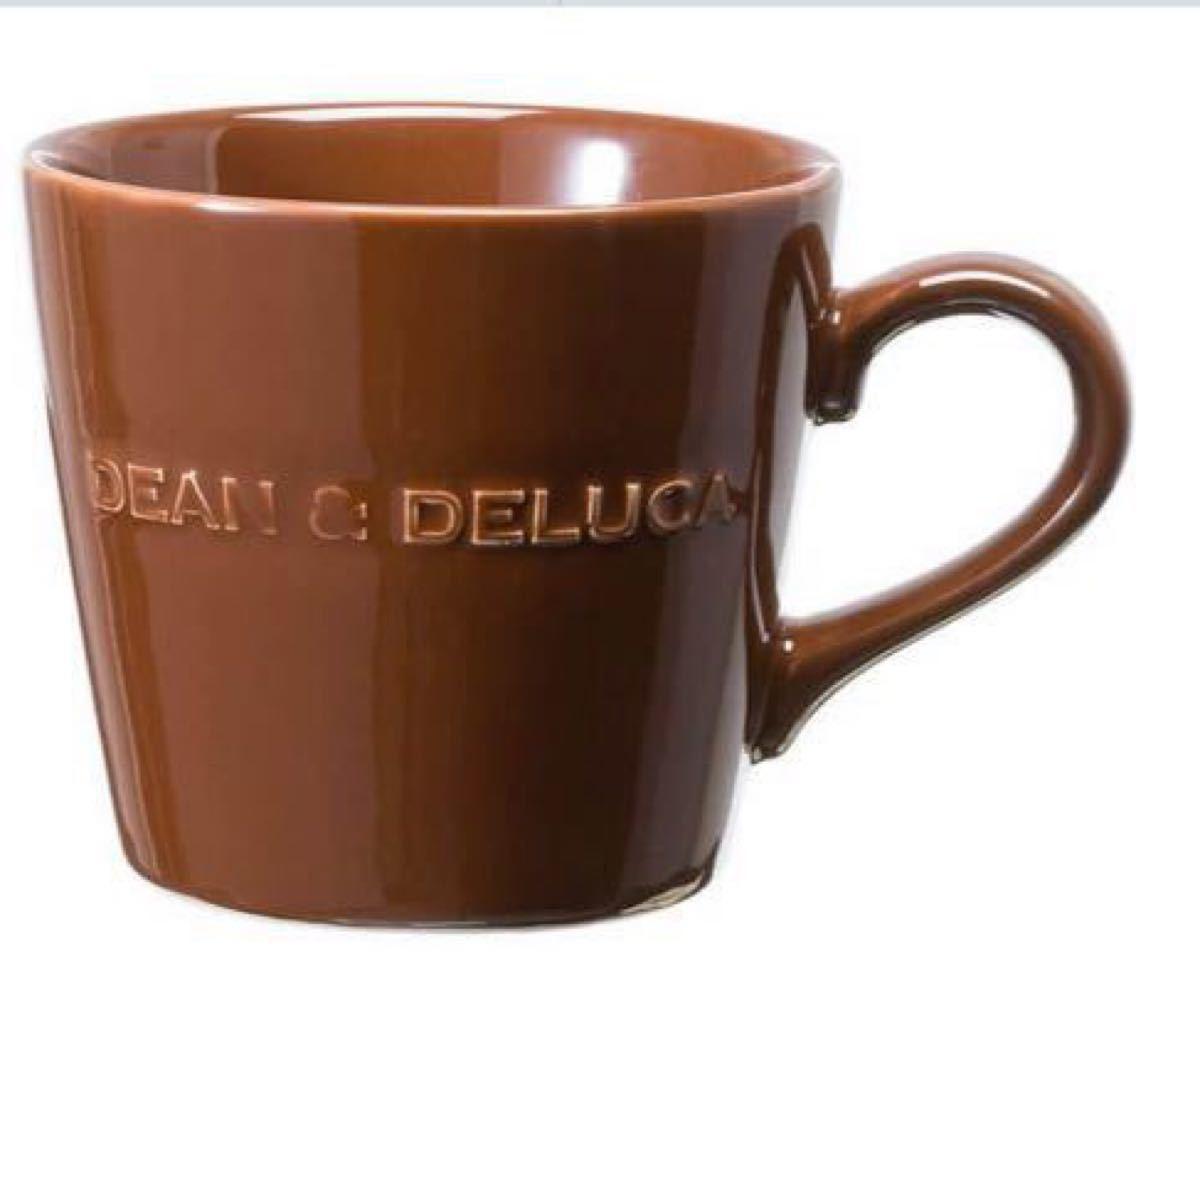 DEAN & DELUCA マグカップ